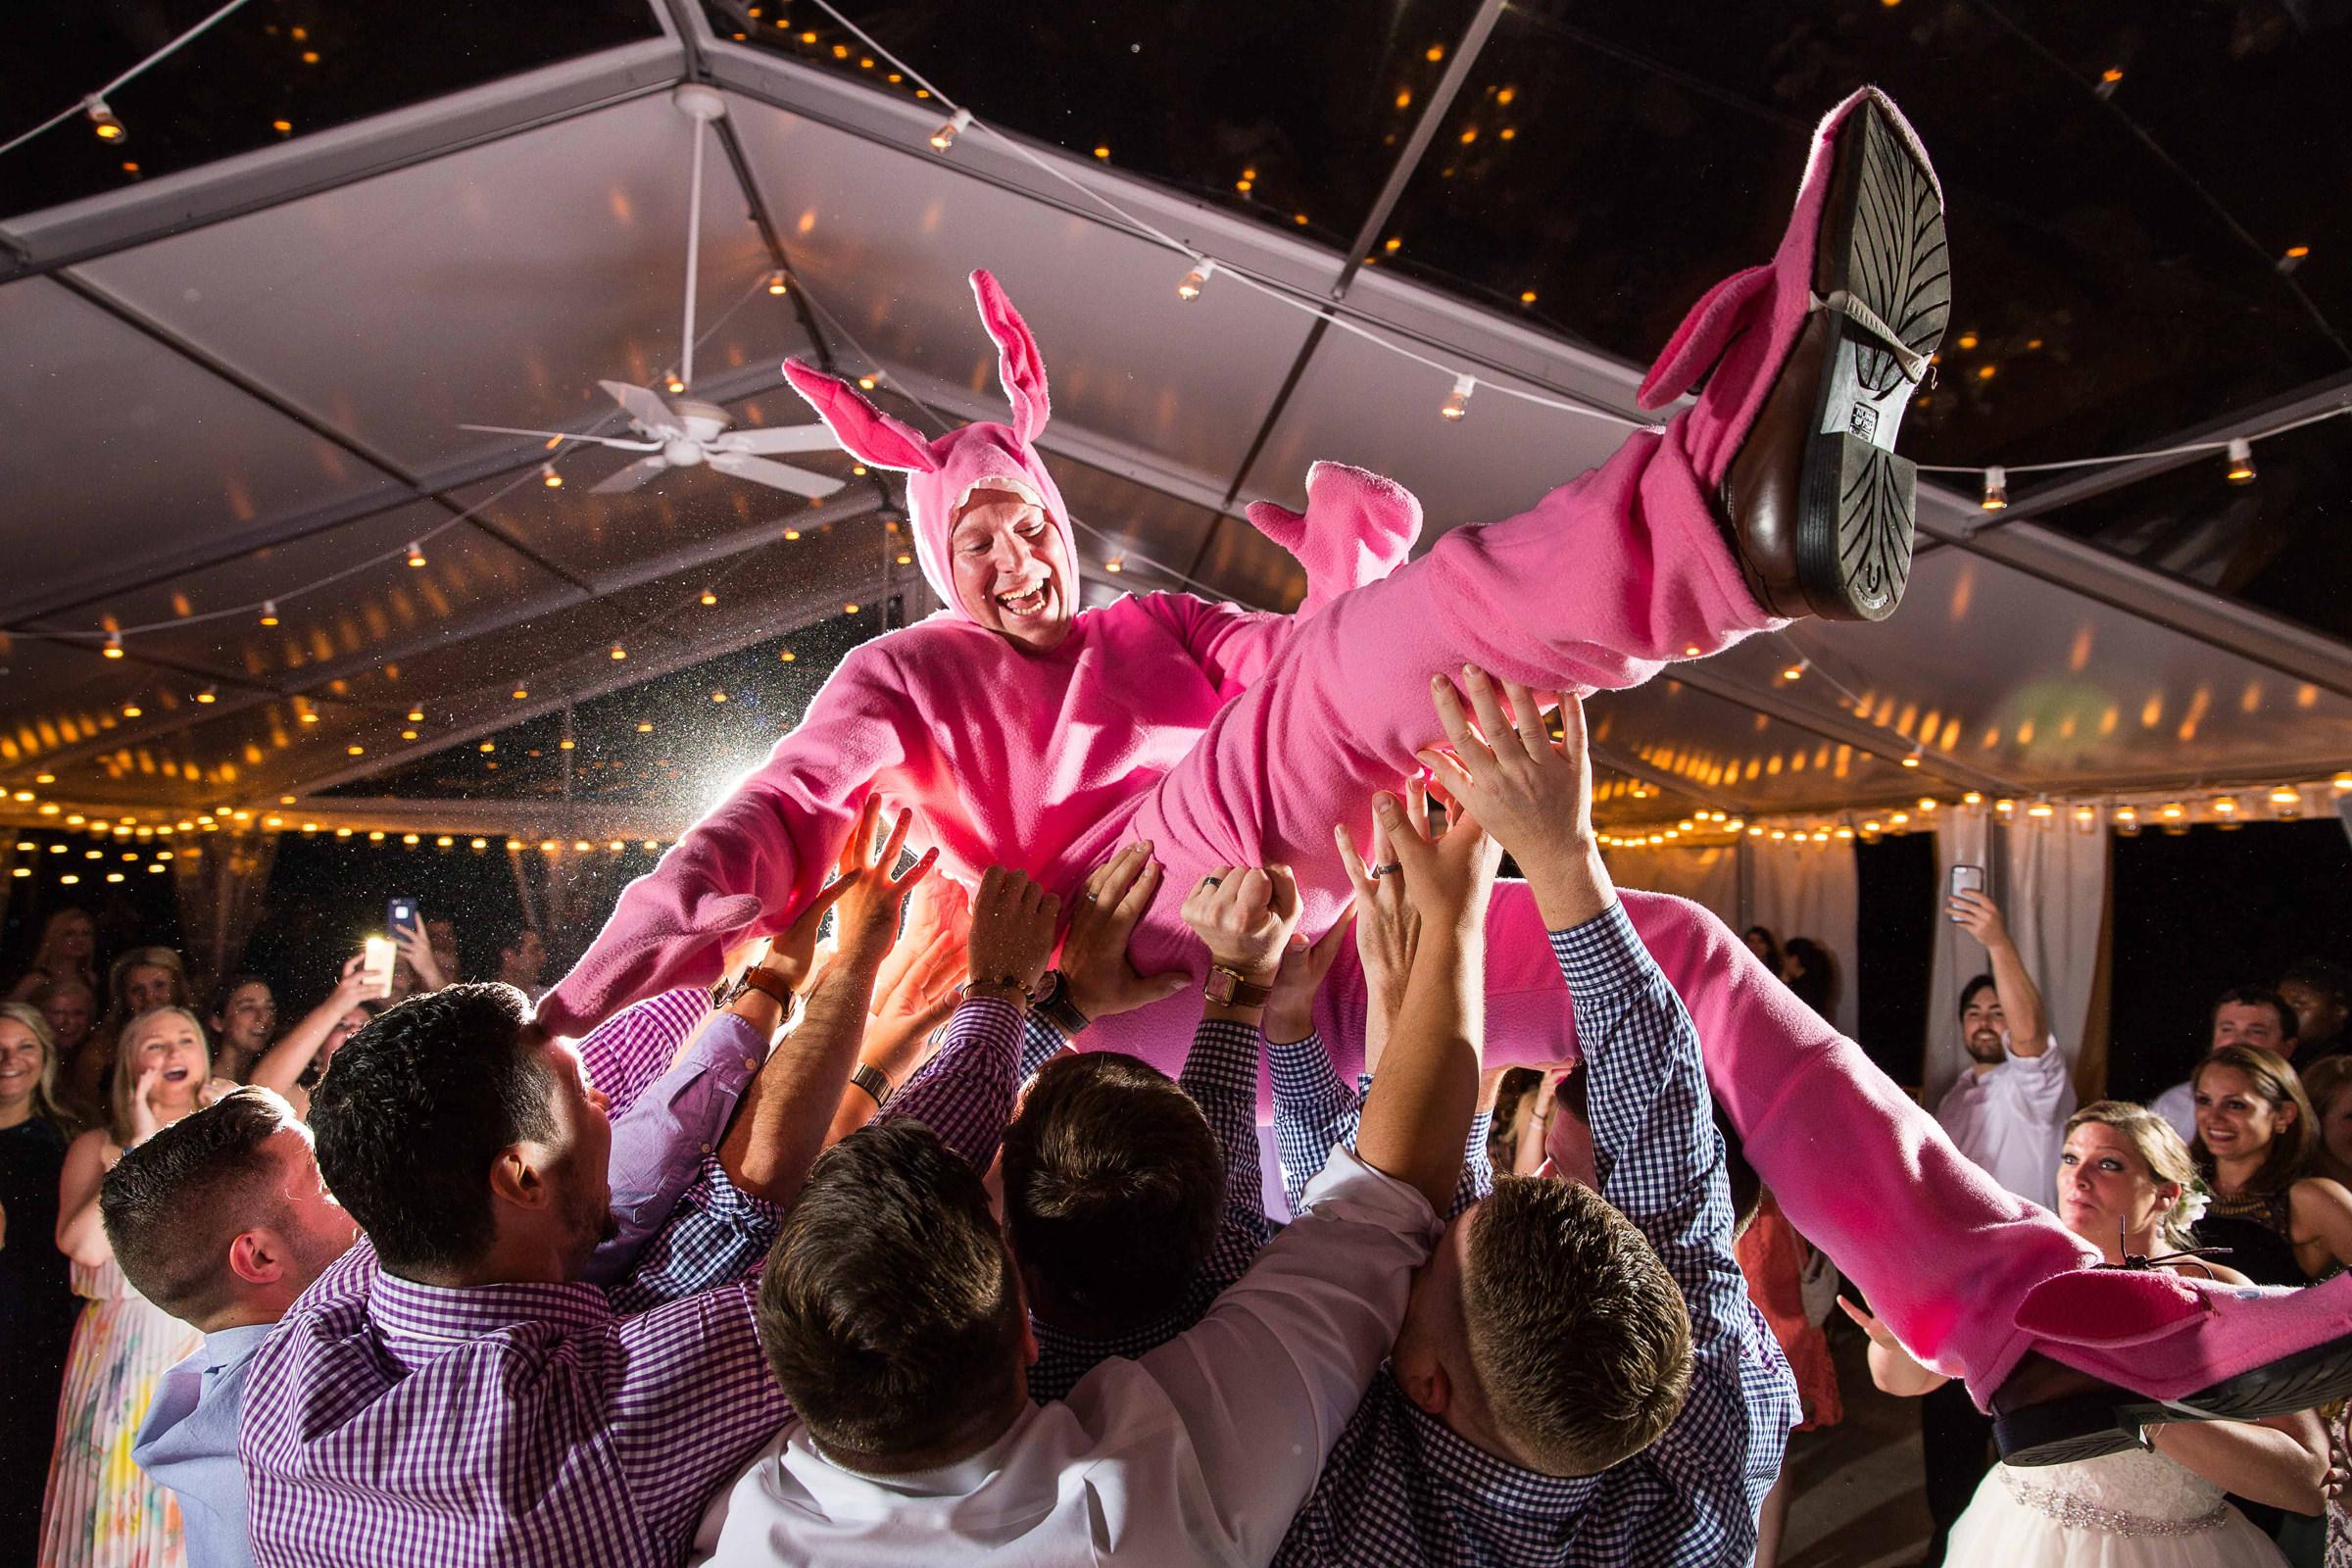 groom-in-pink-bunny-costume-held-aloft-fuller-photography